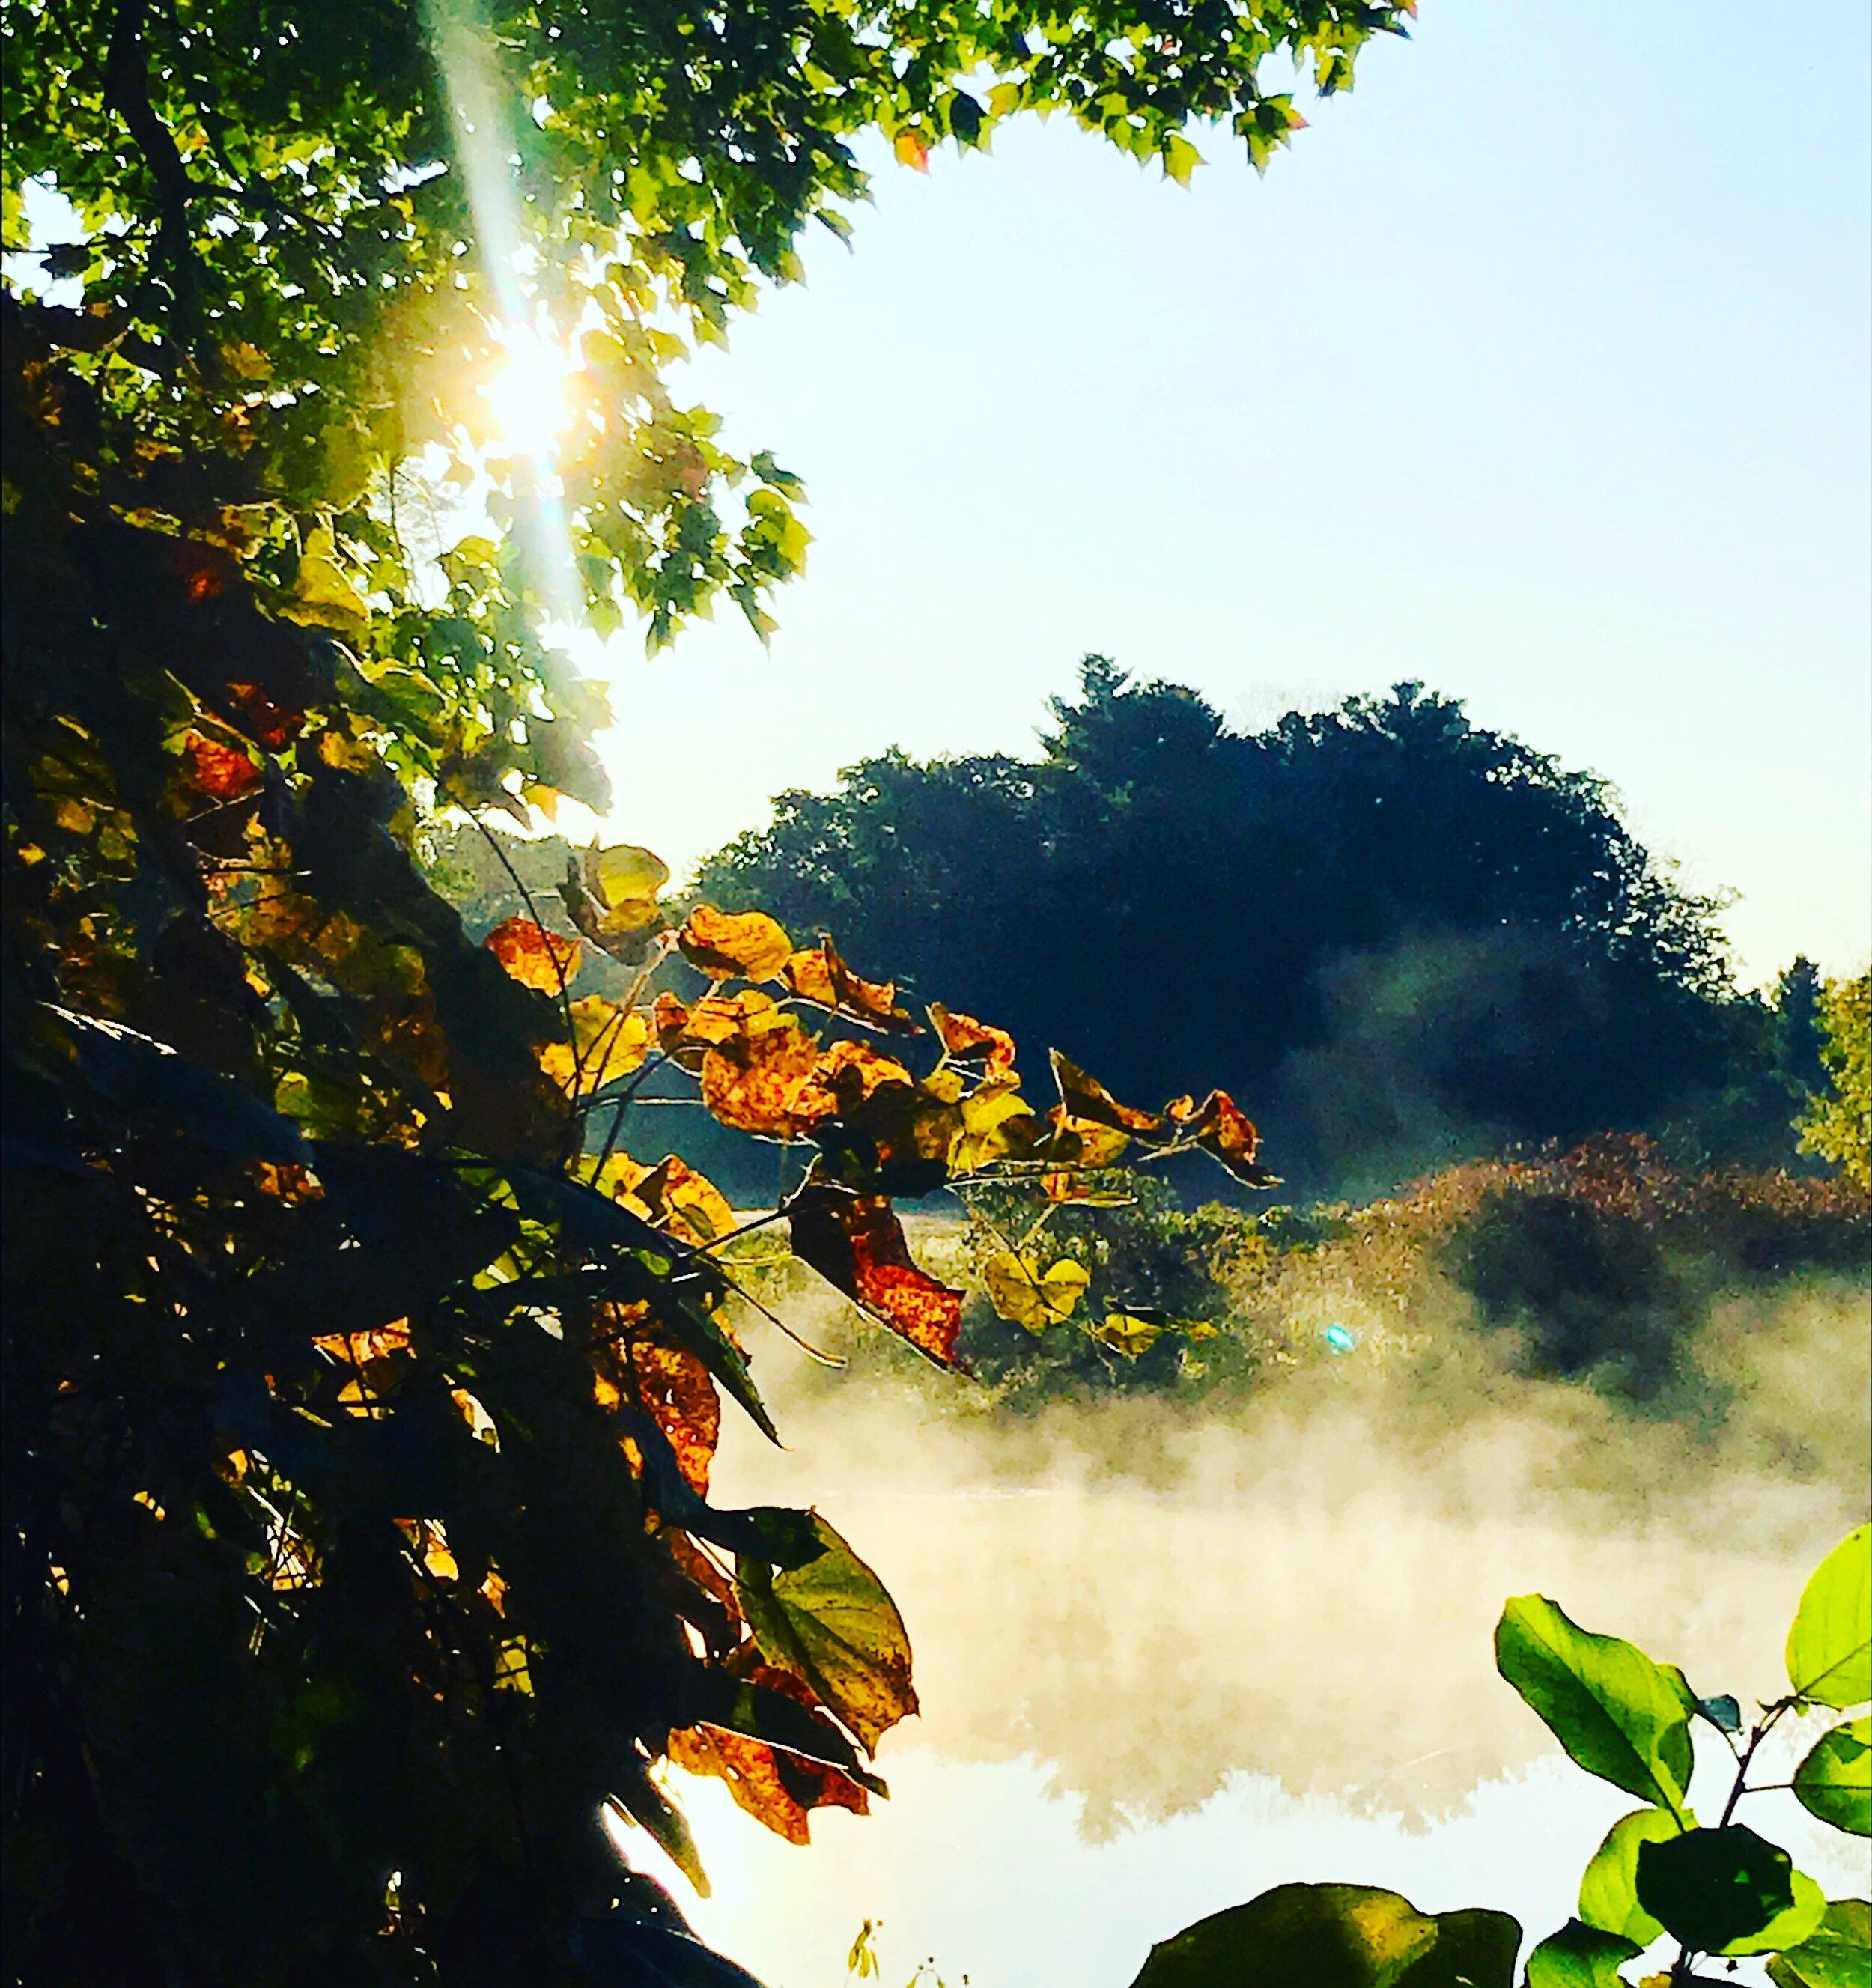 Misty Charles River morning